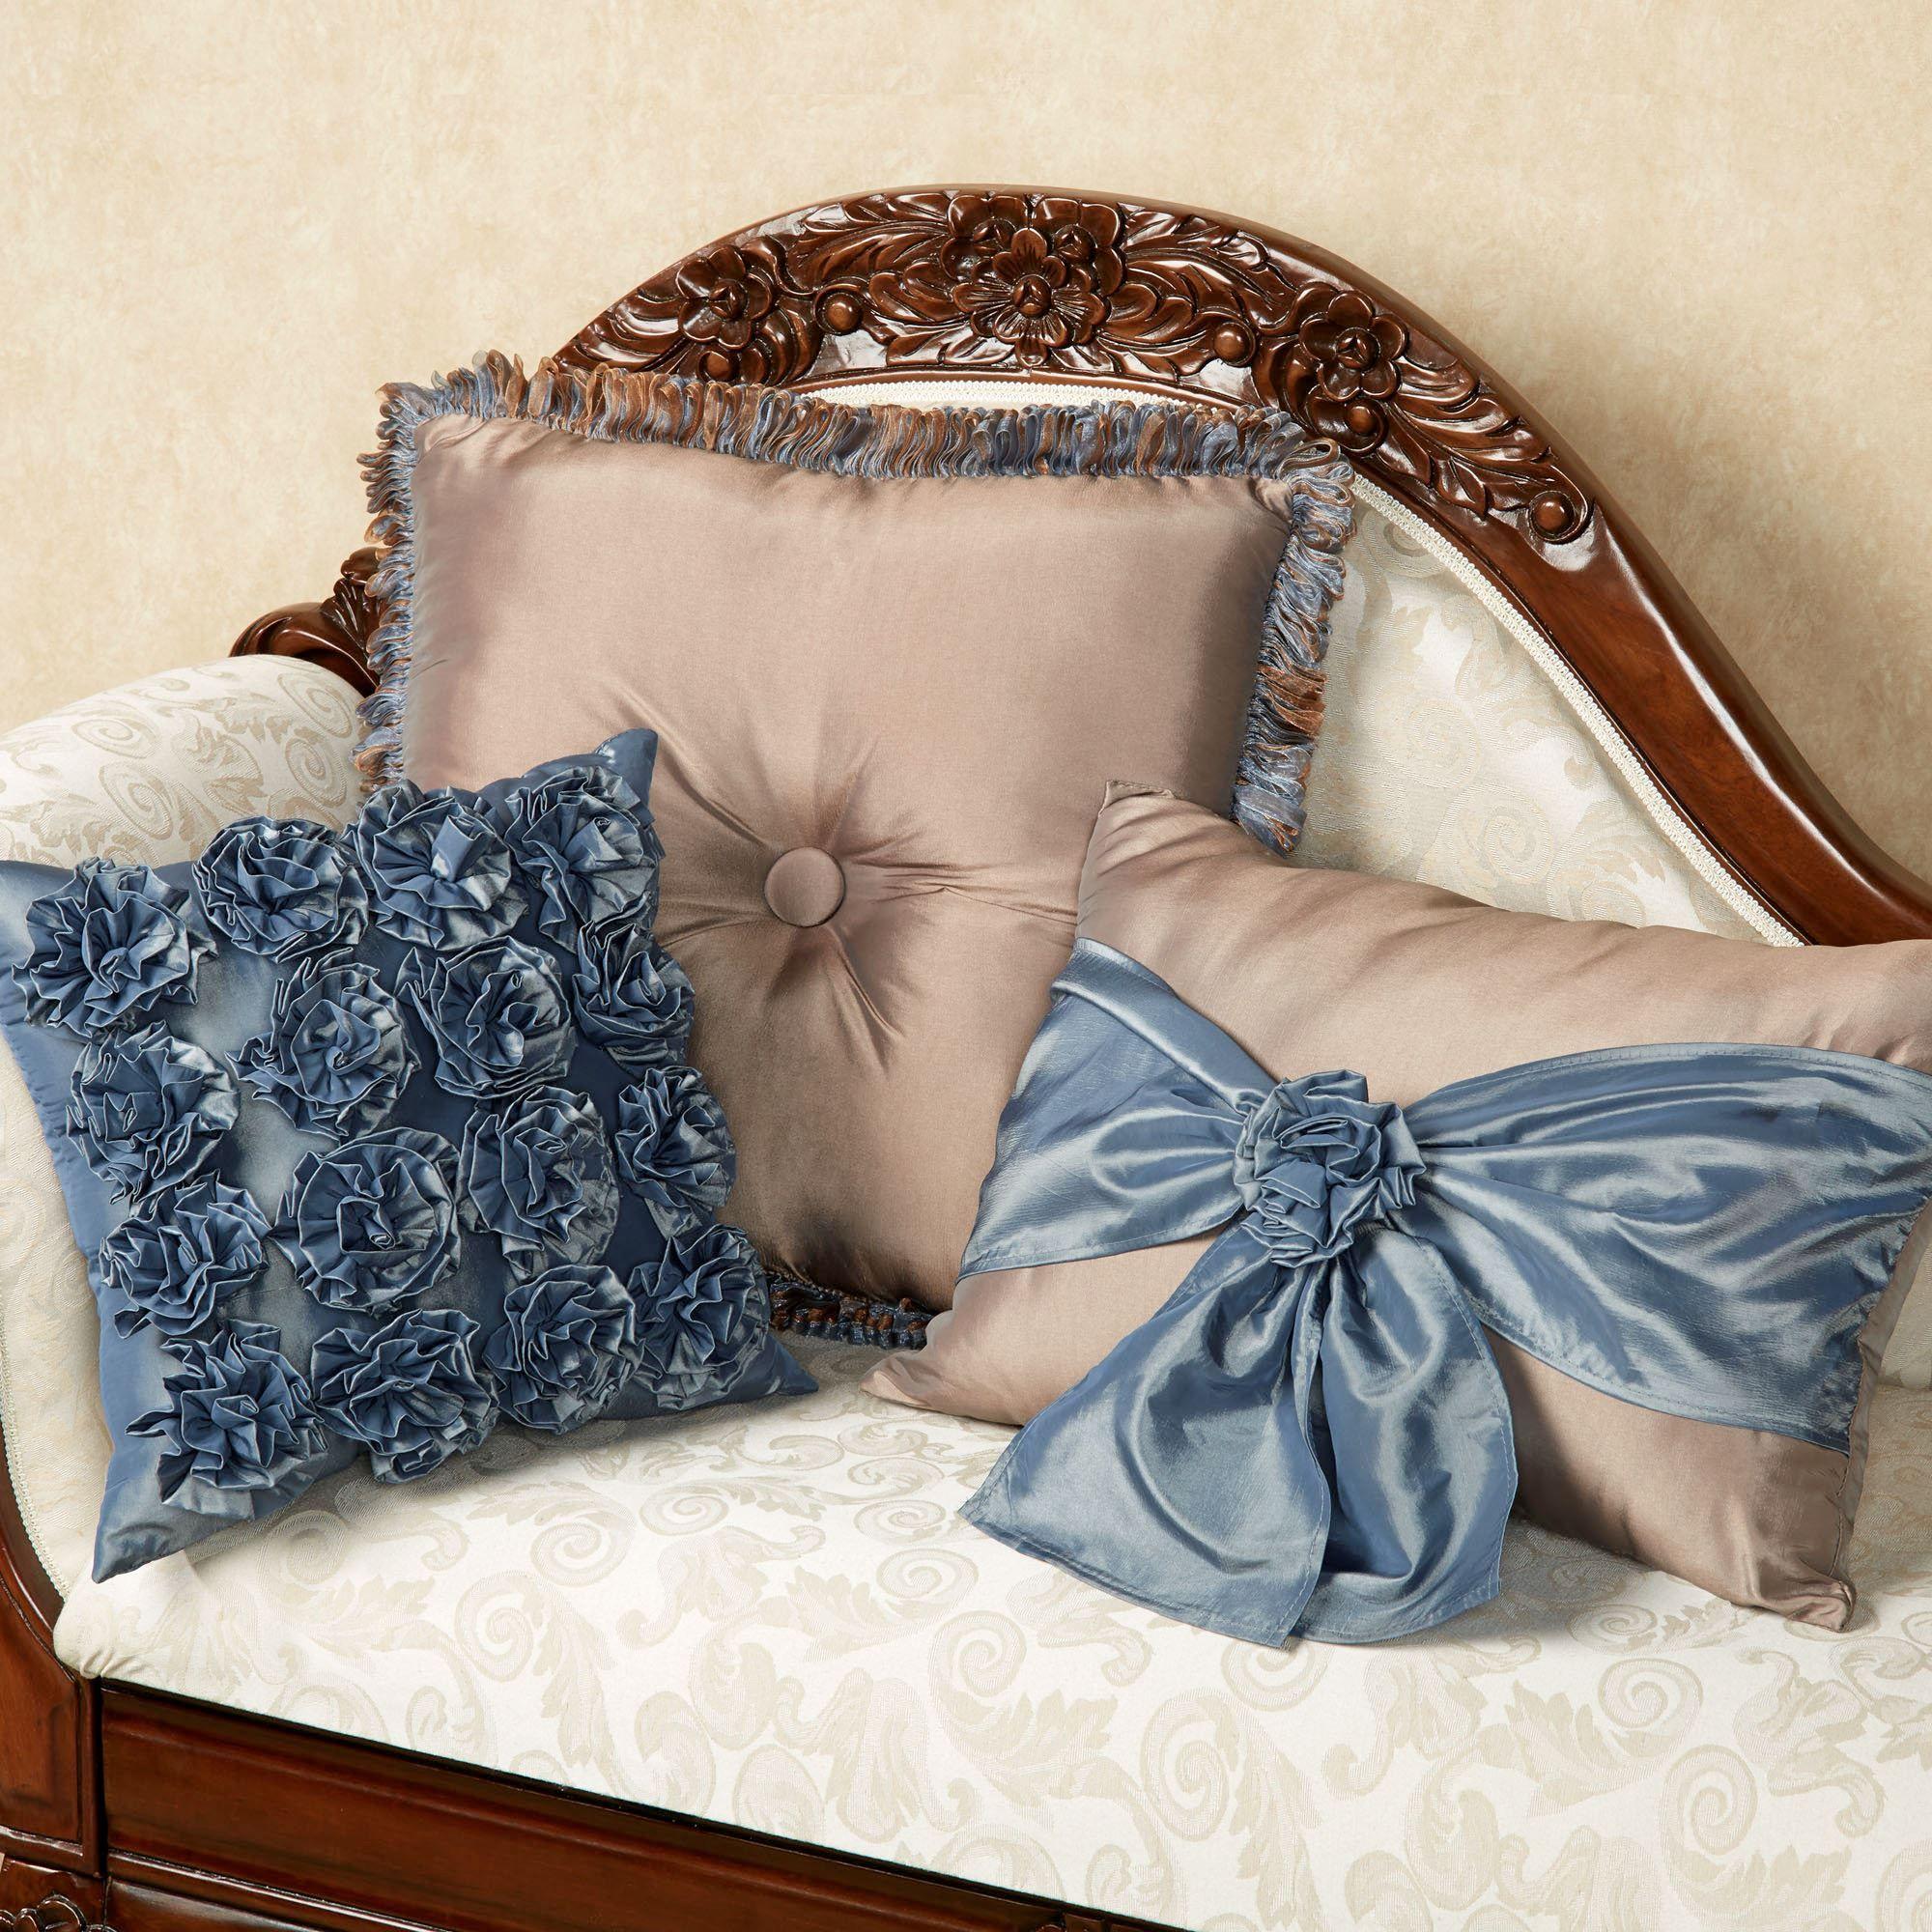 linen covers bedding sets pillows bed duvet lewis john garden home alpha blockb and bedroom cover